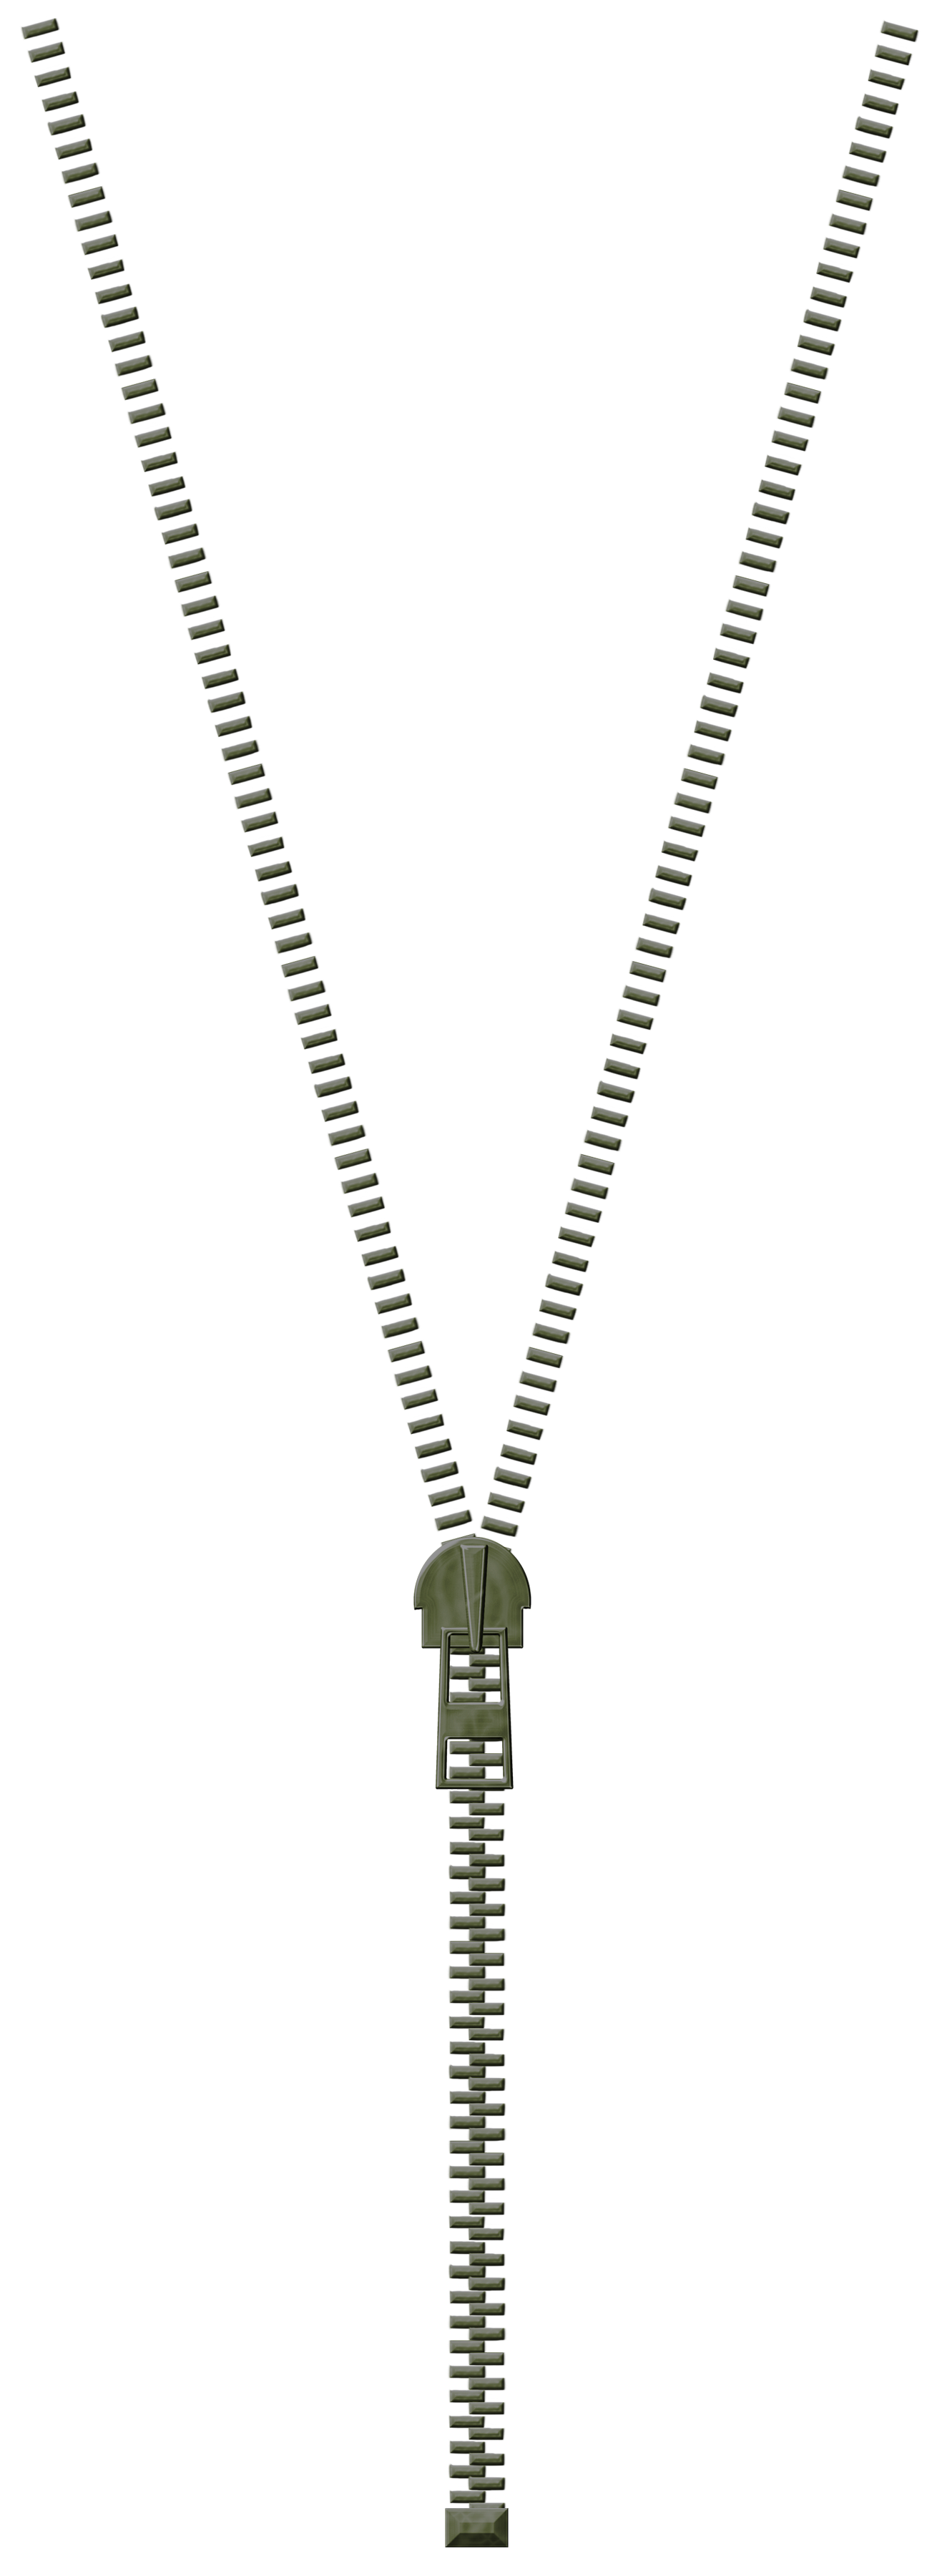 Zipper's PNG Image